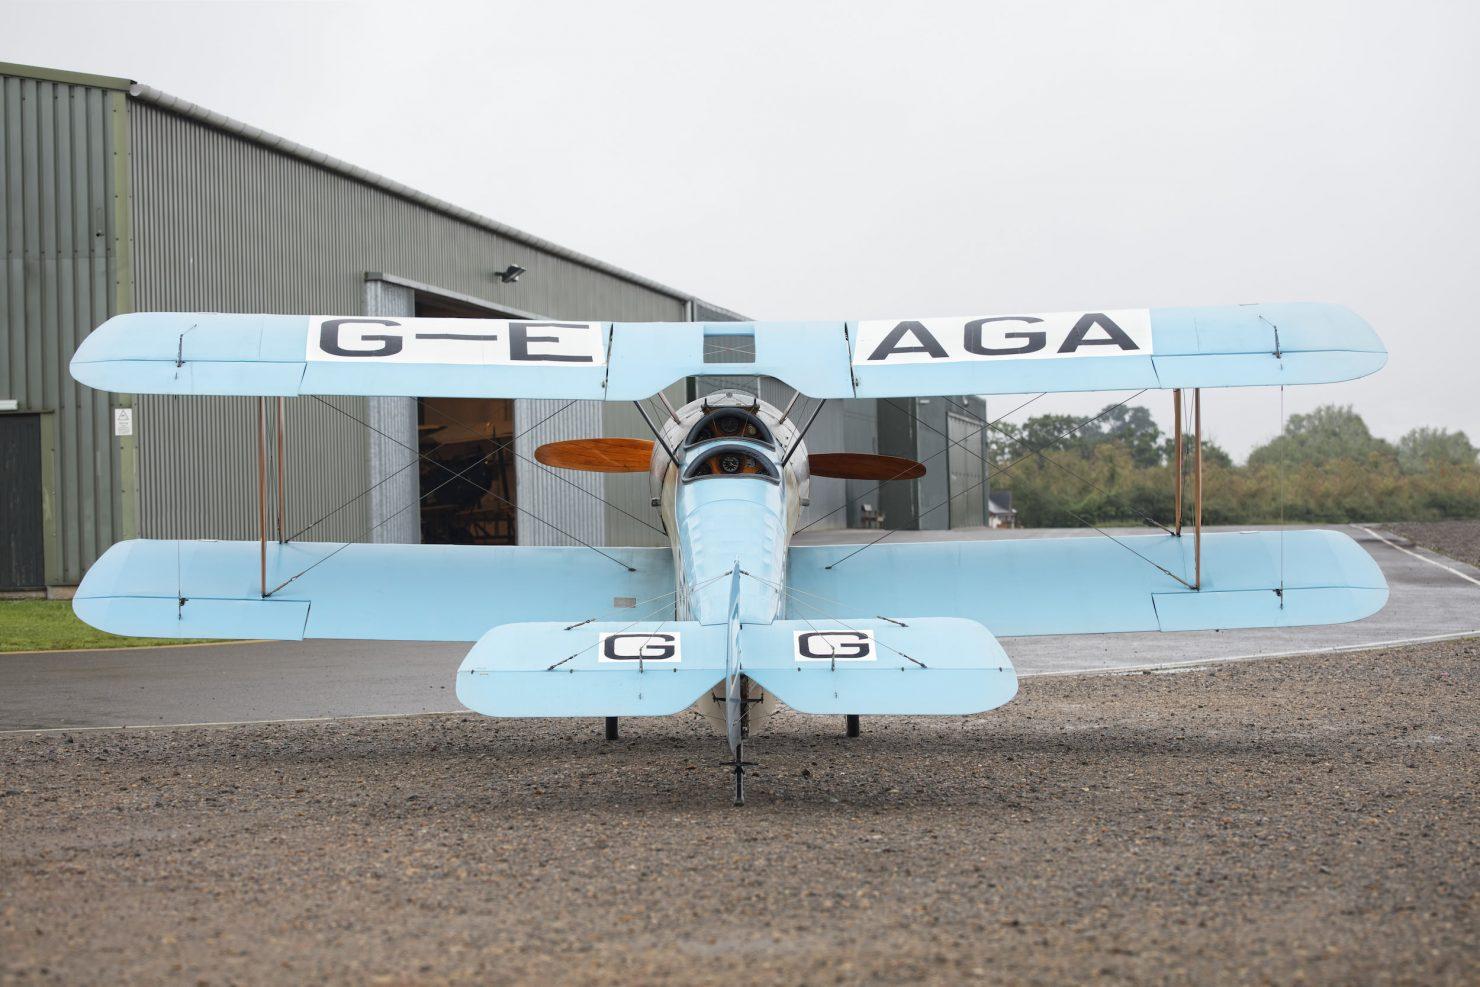 Sopwith Dove Two Seat Biplane 5 1480x987 - Sopwith Dove Biplane